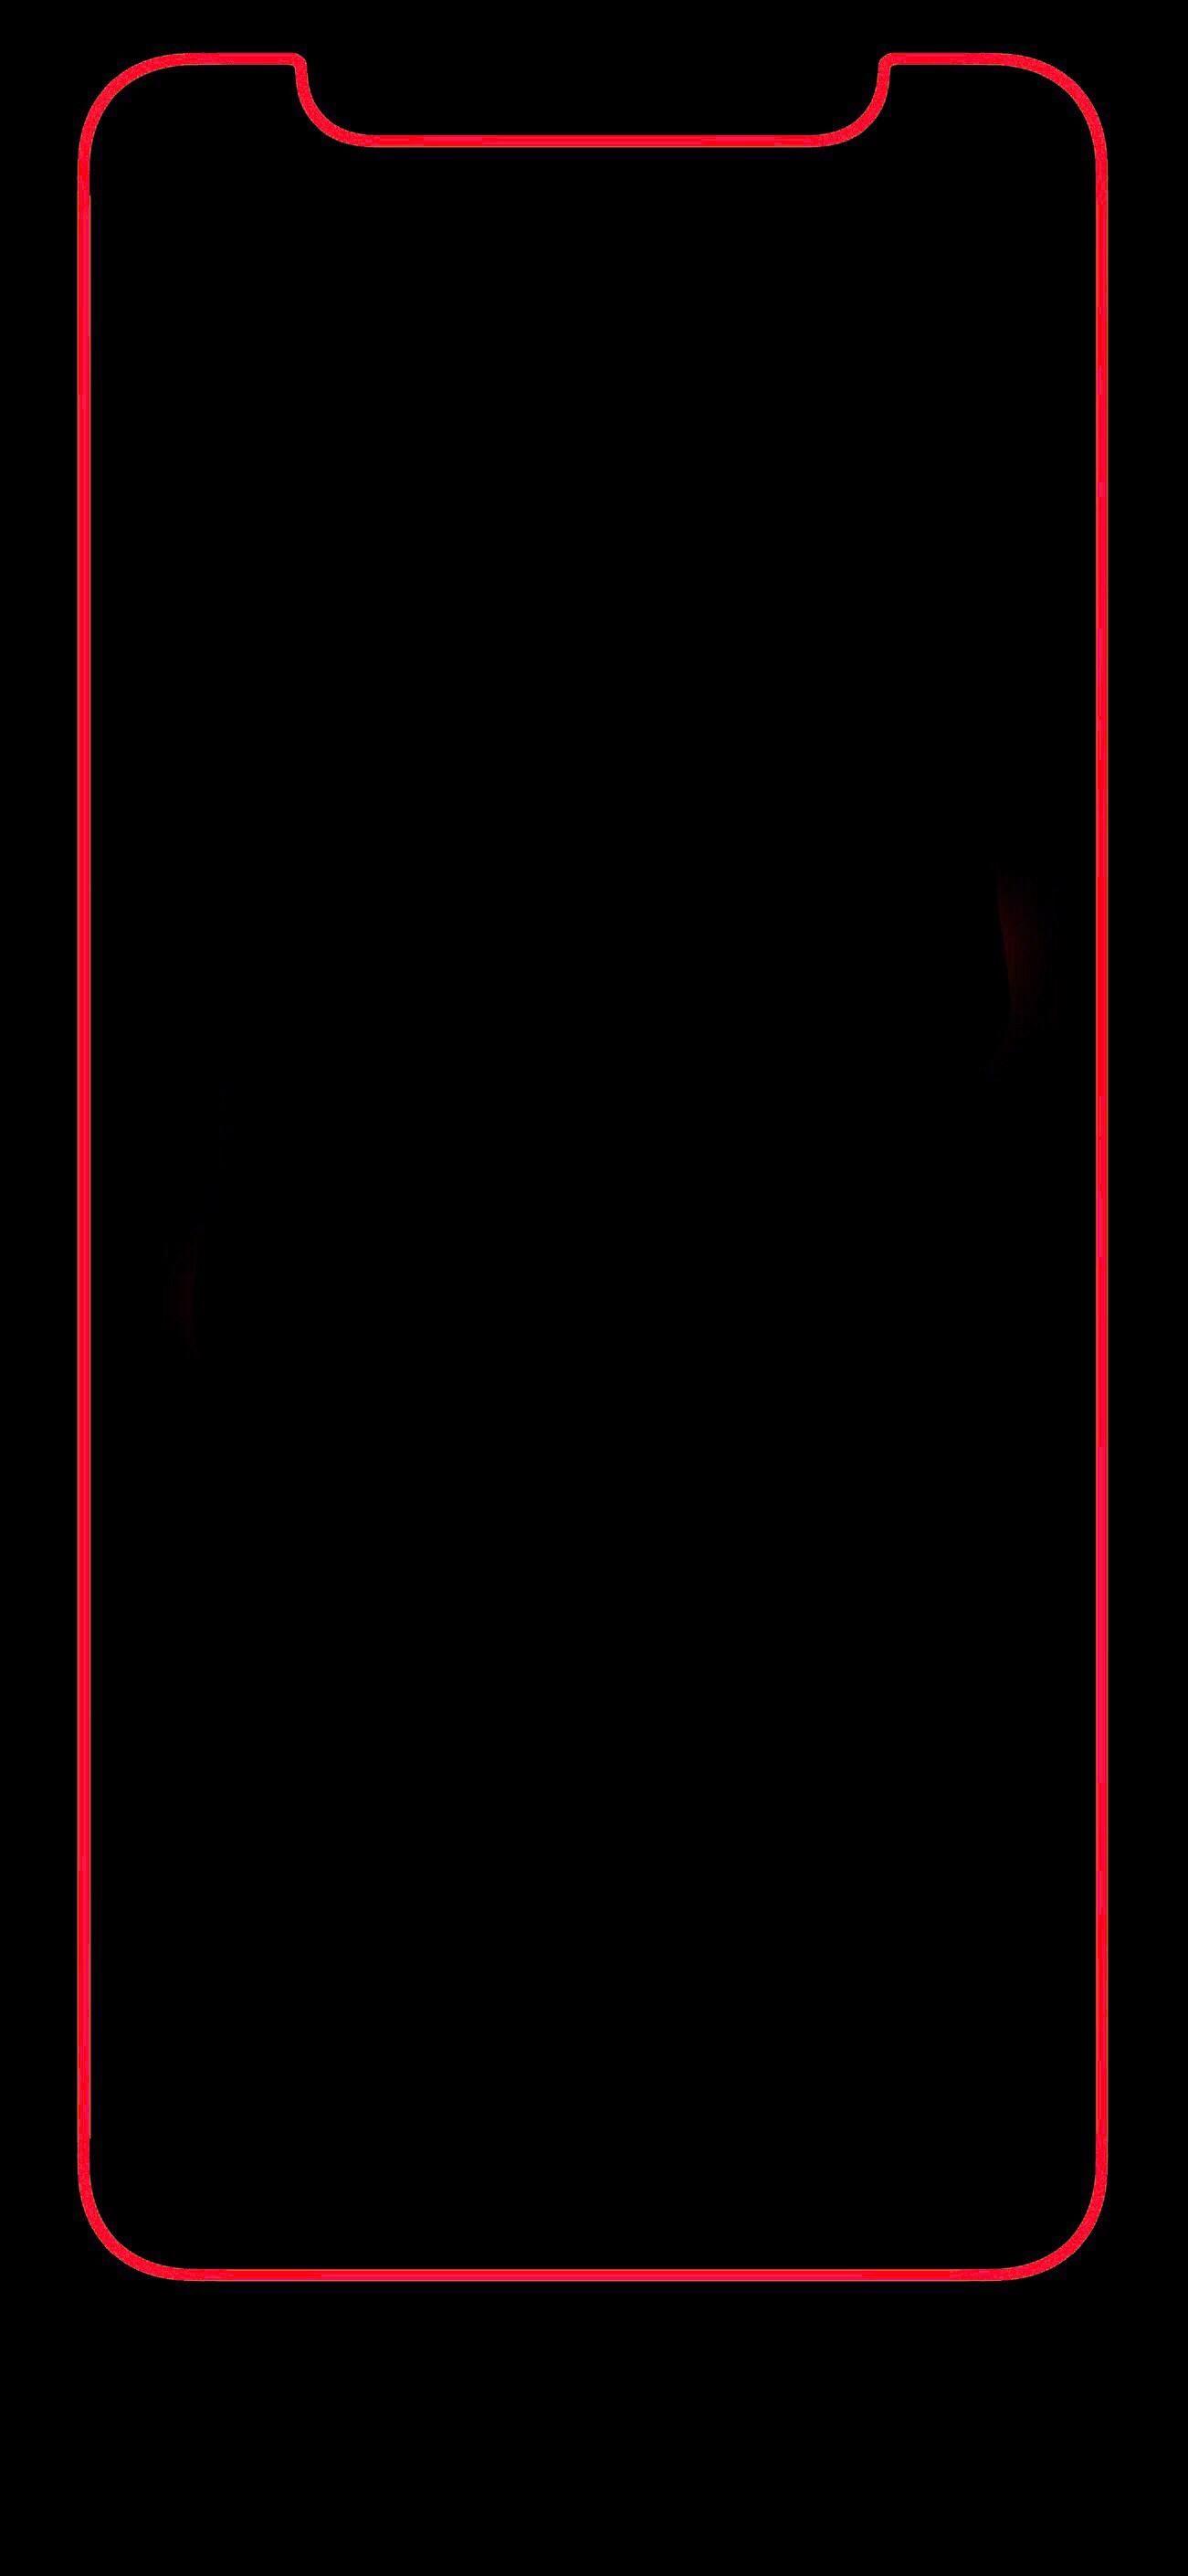 Iphone 11 Border Wallpaper : iphone, border, wallpaper, IPhone, Wallpaper